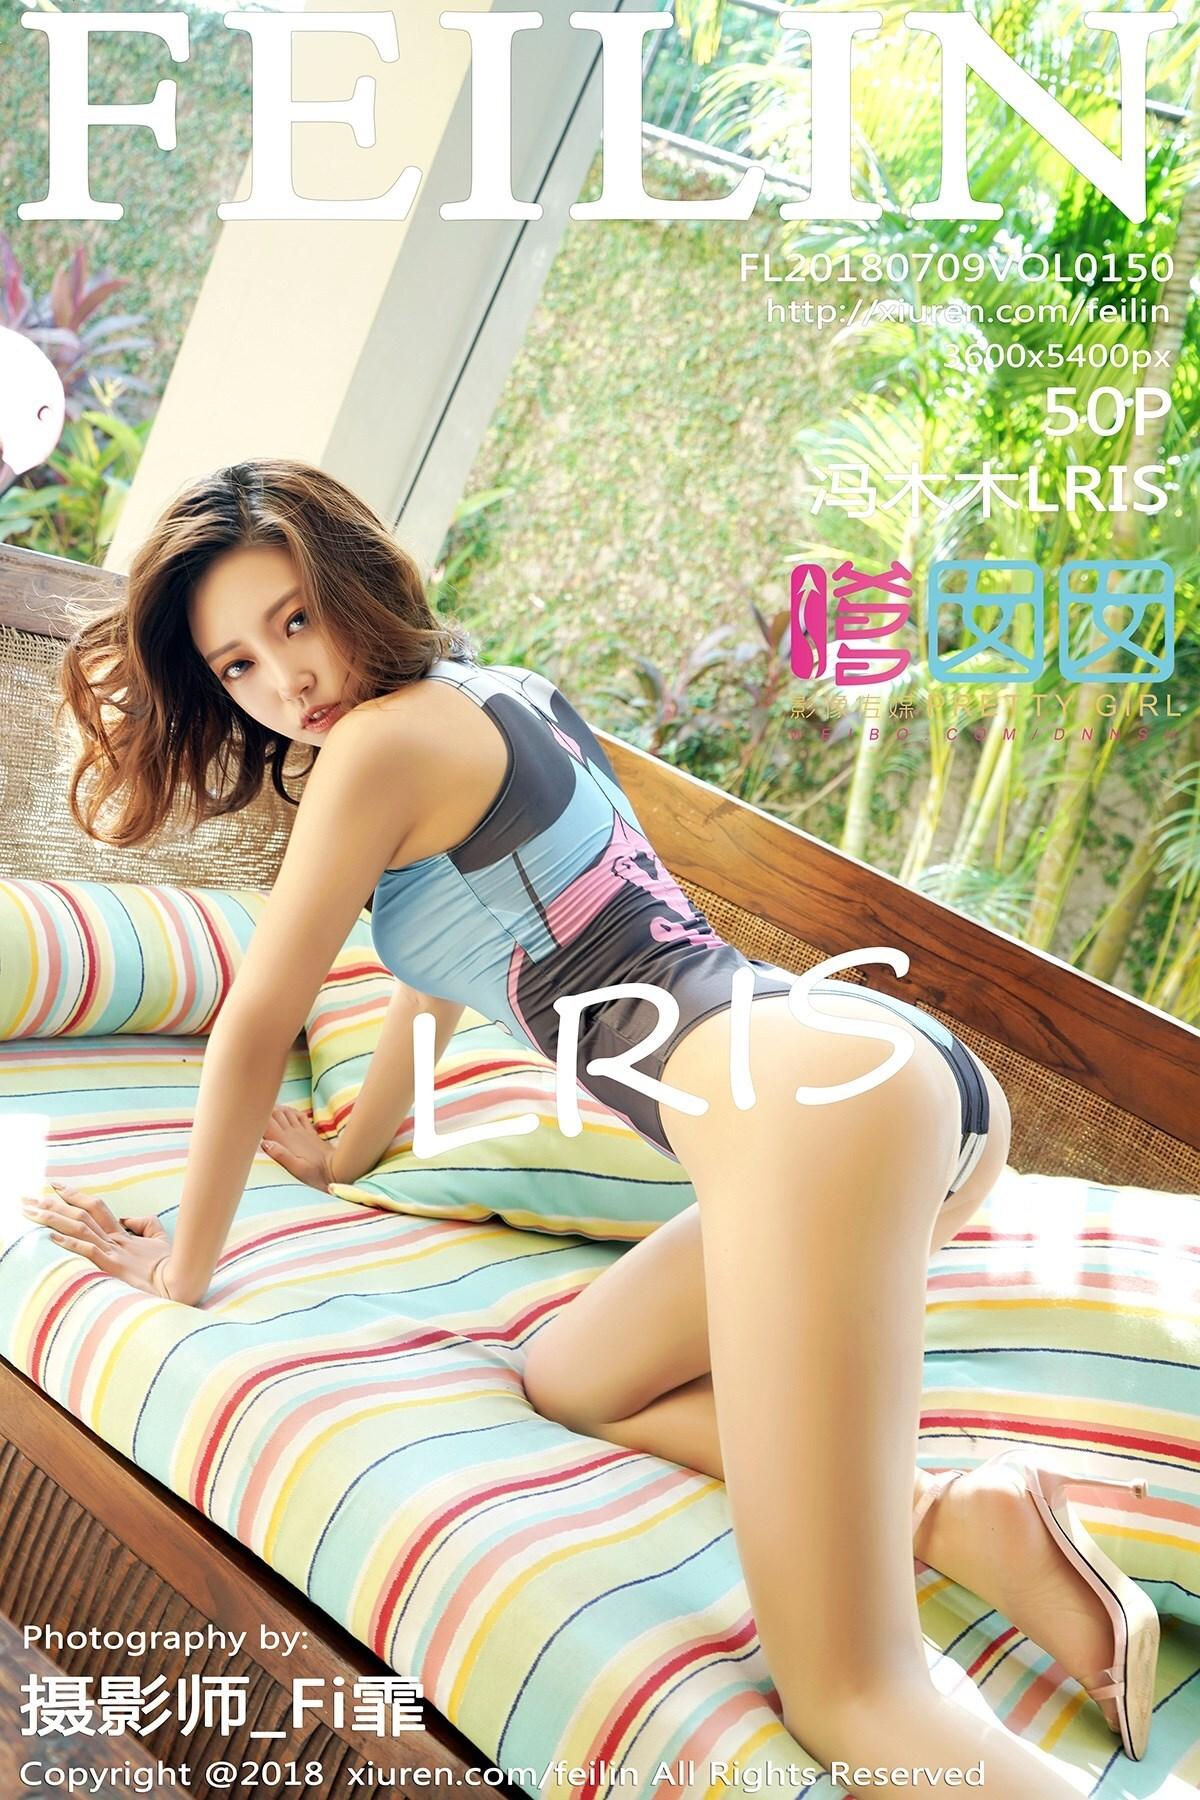 FEILIN 嗲囡囡 2018.07.09 Vol.150 冯木木LRIS